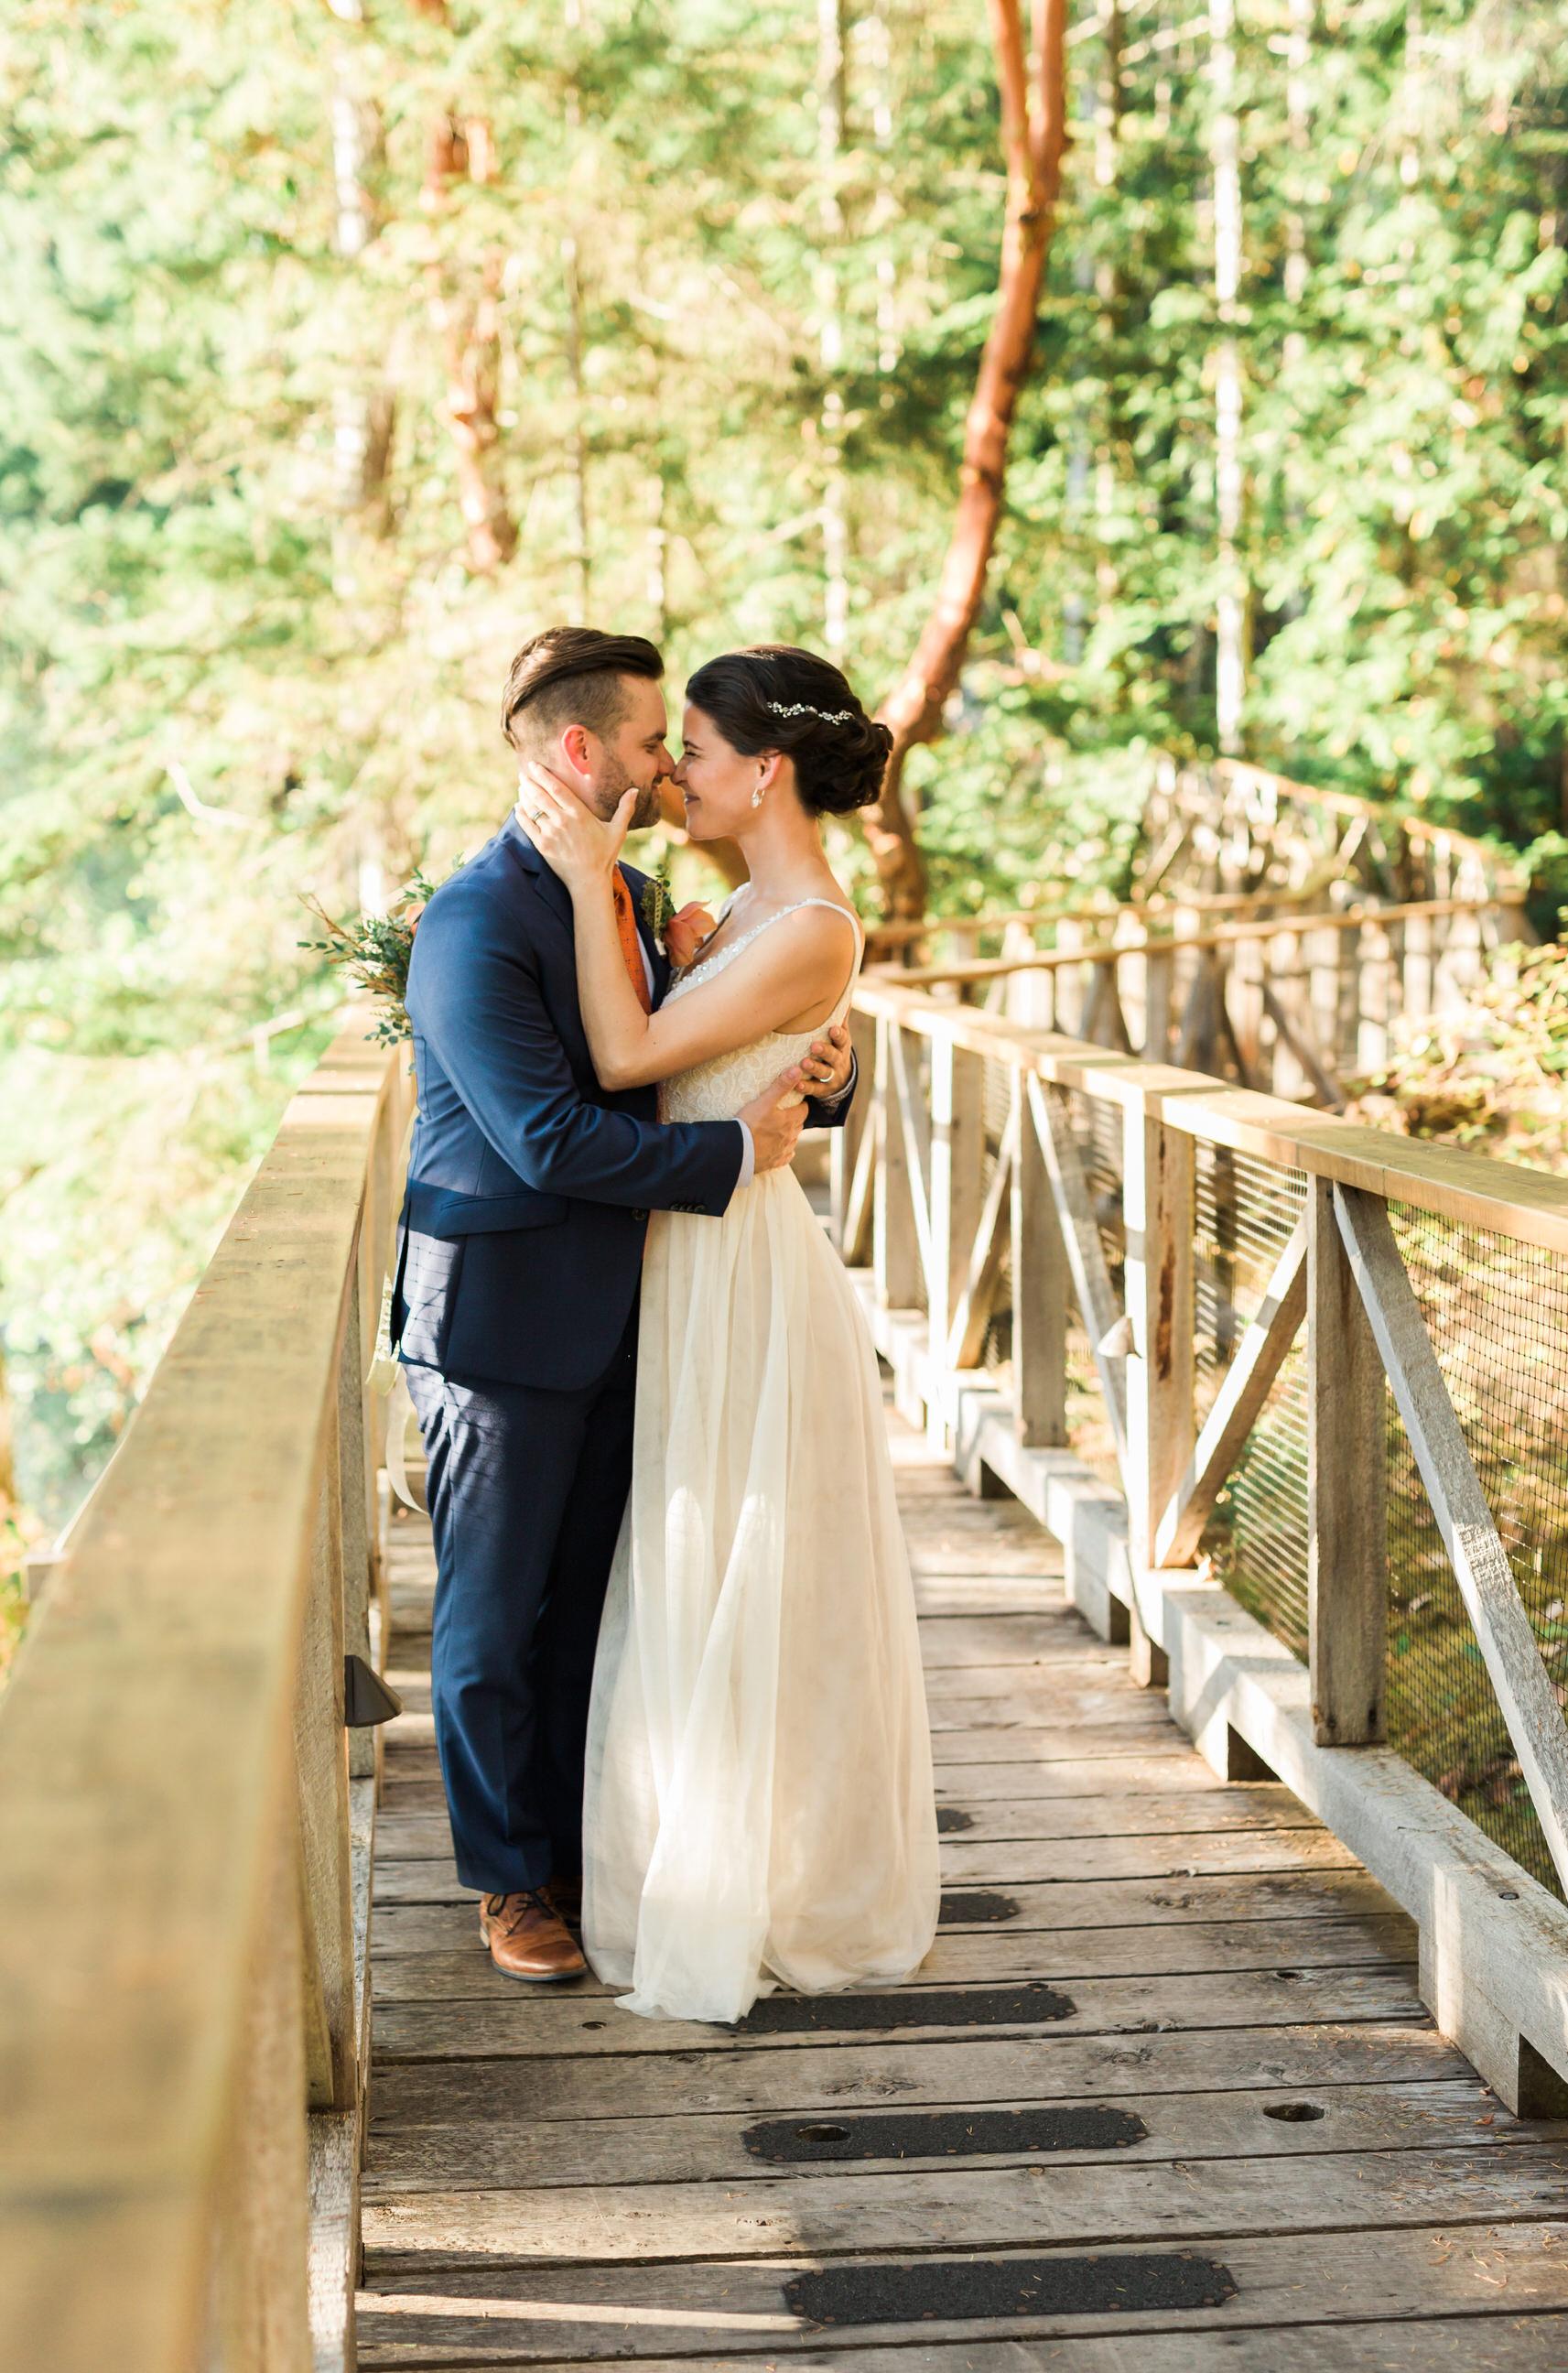 Rockwater Secret Cove Resort Wedding - Sunshine Coast BC Wedding Photographer - Vancouver Wedding Photographer - Sunshine Coast Elopement Photos - IMG_0846.jpg